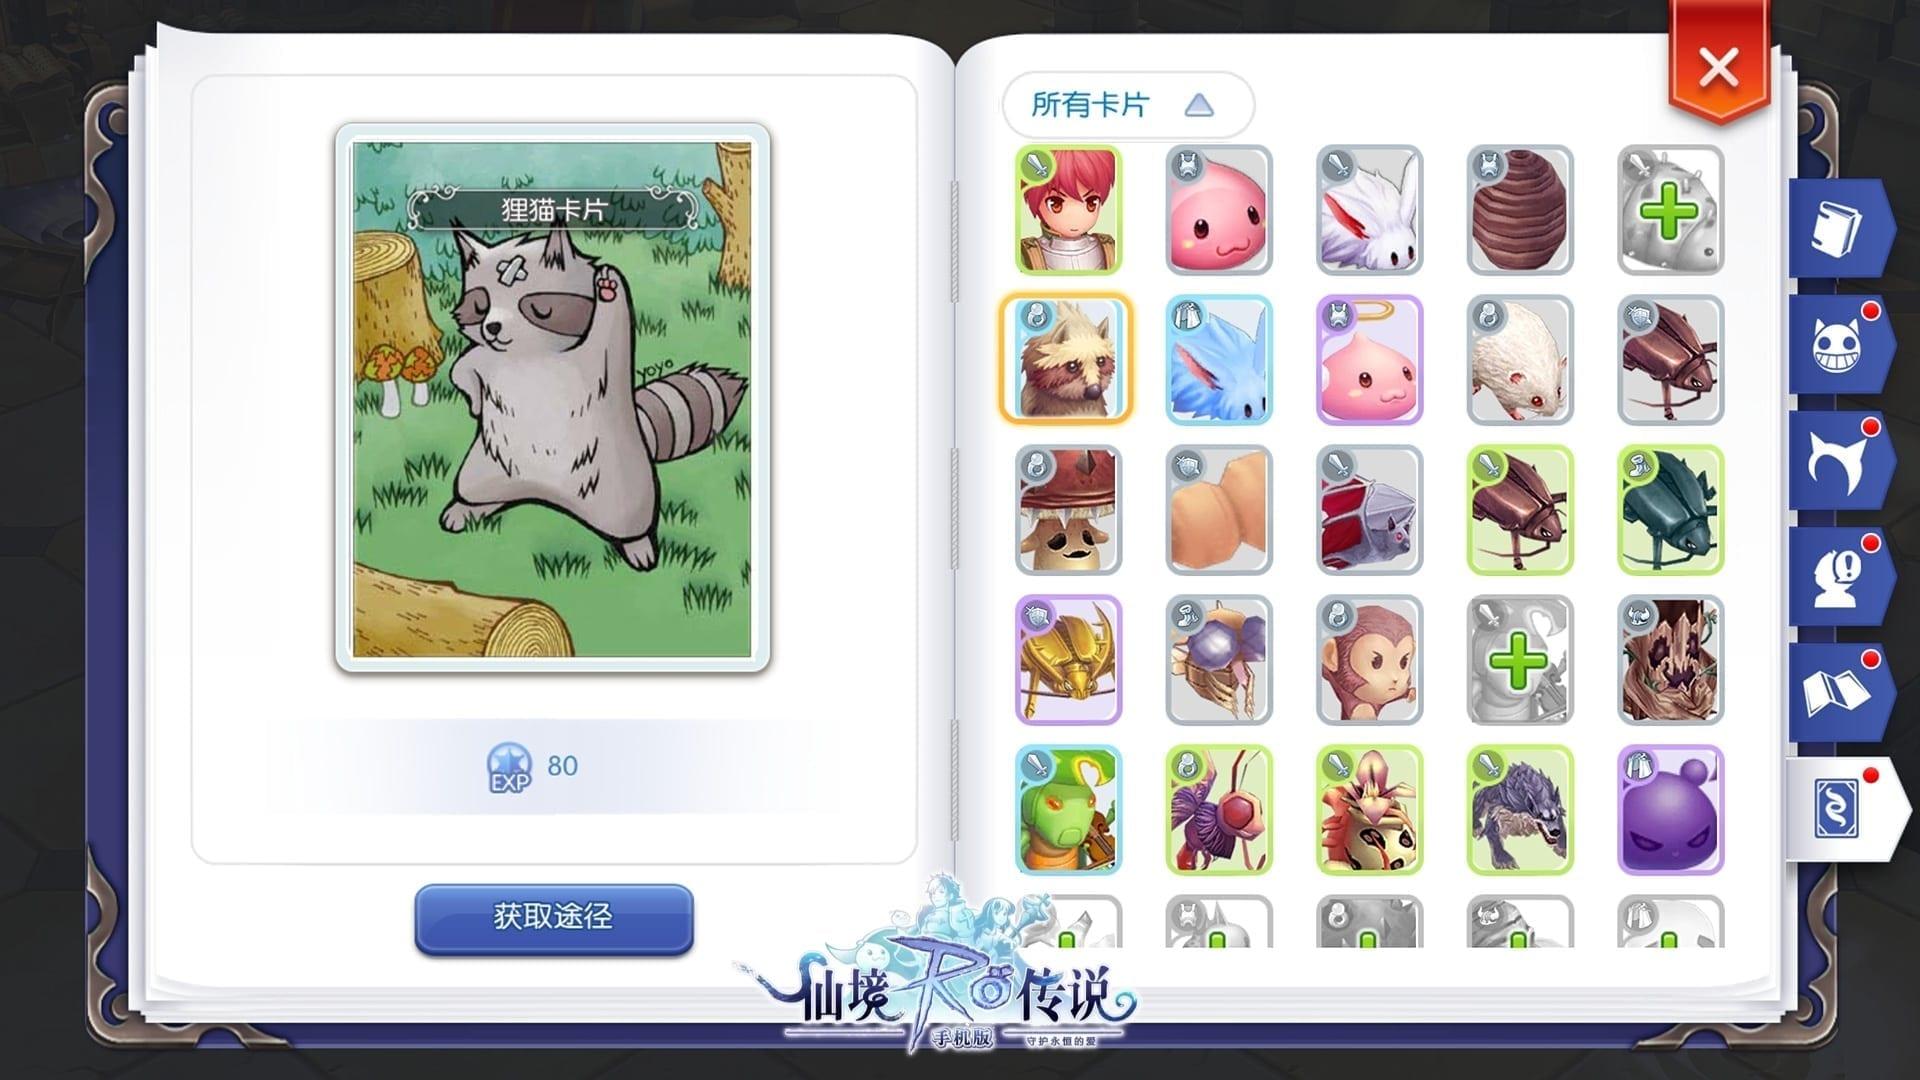 ragnarok-mobile-screenshot-2